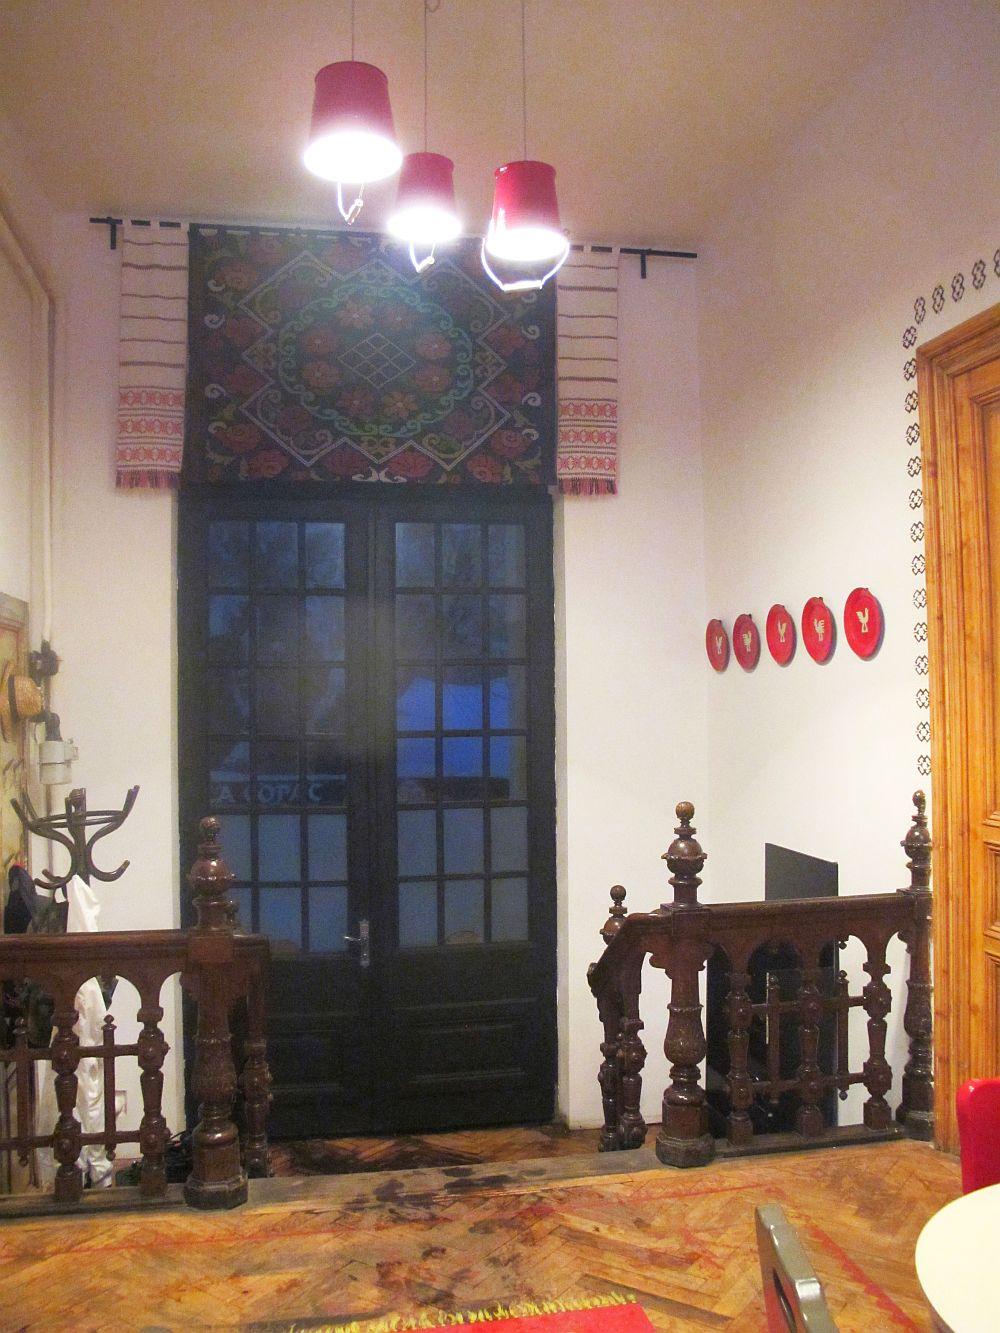 adelaparvu.com despre La Copac, design Interior Mihai Grama (6)